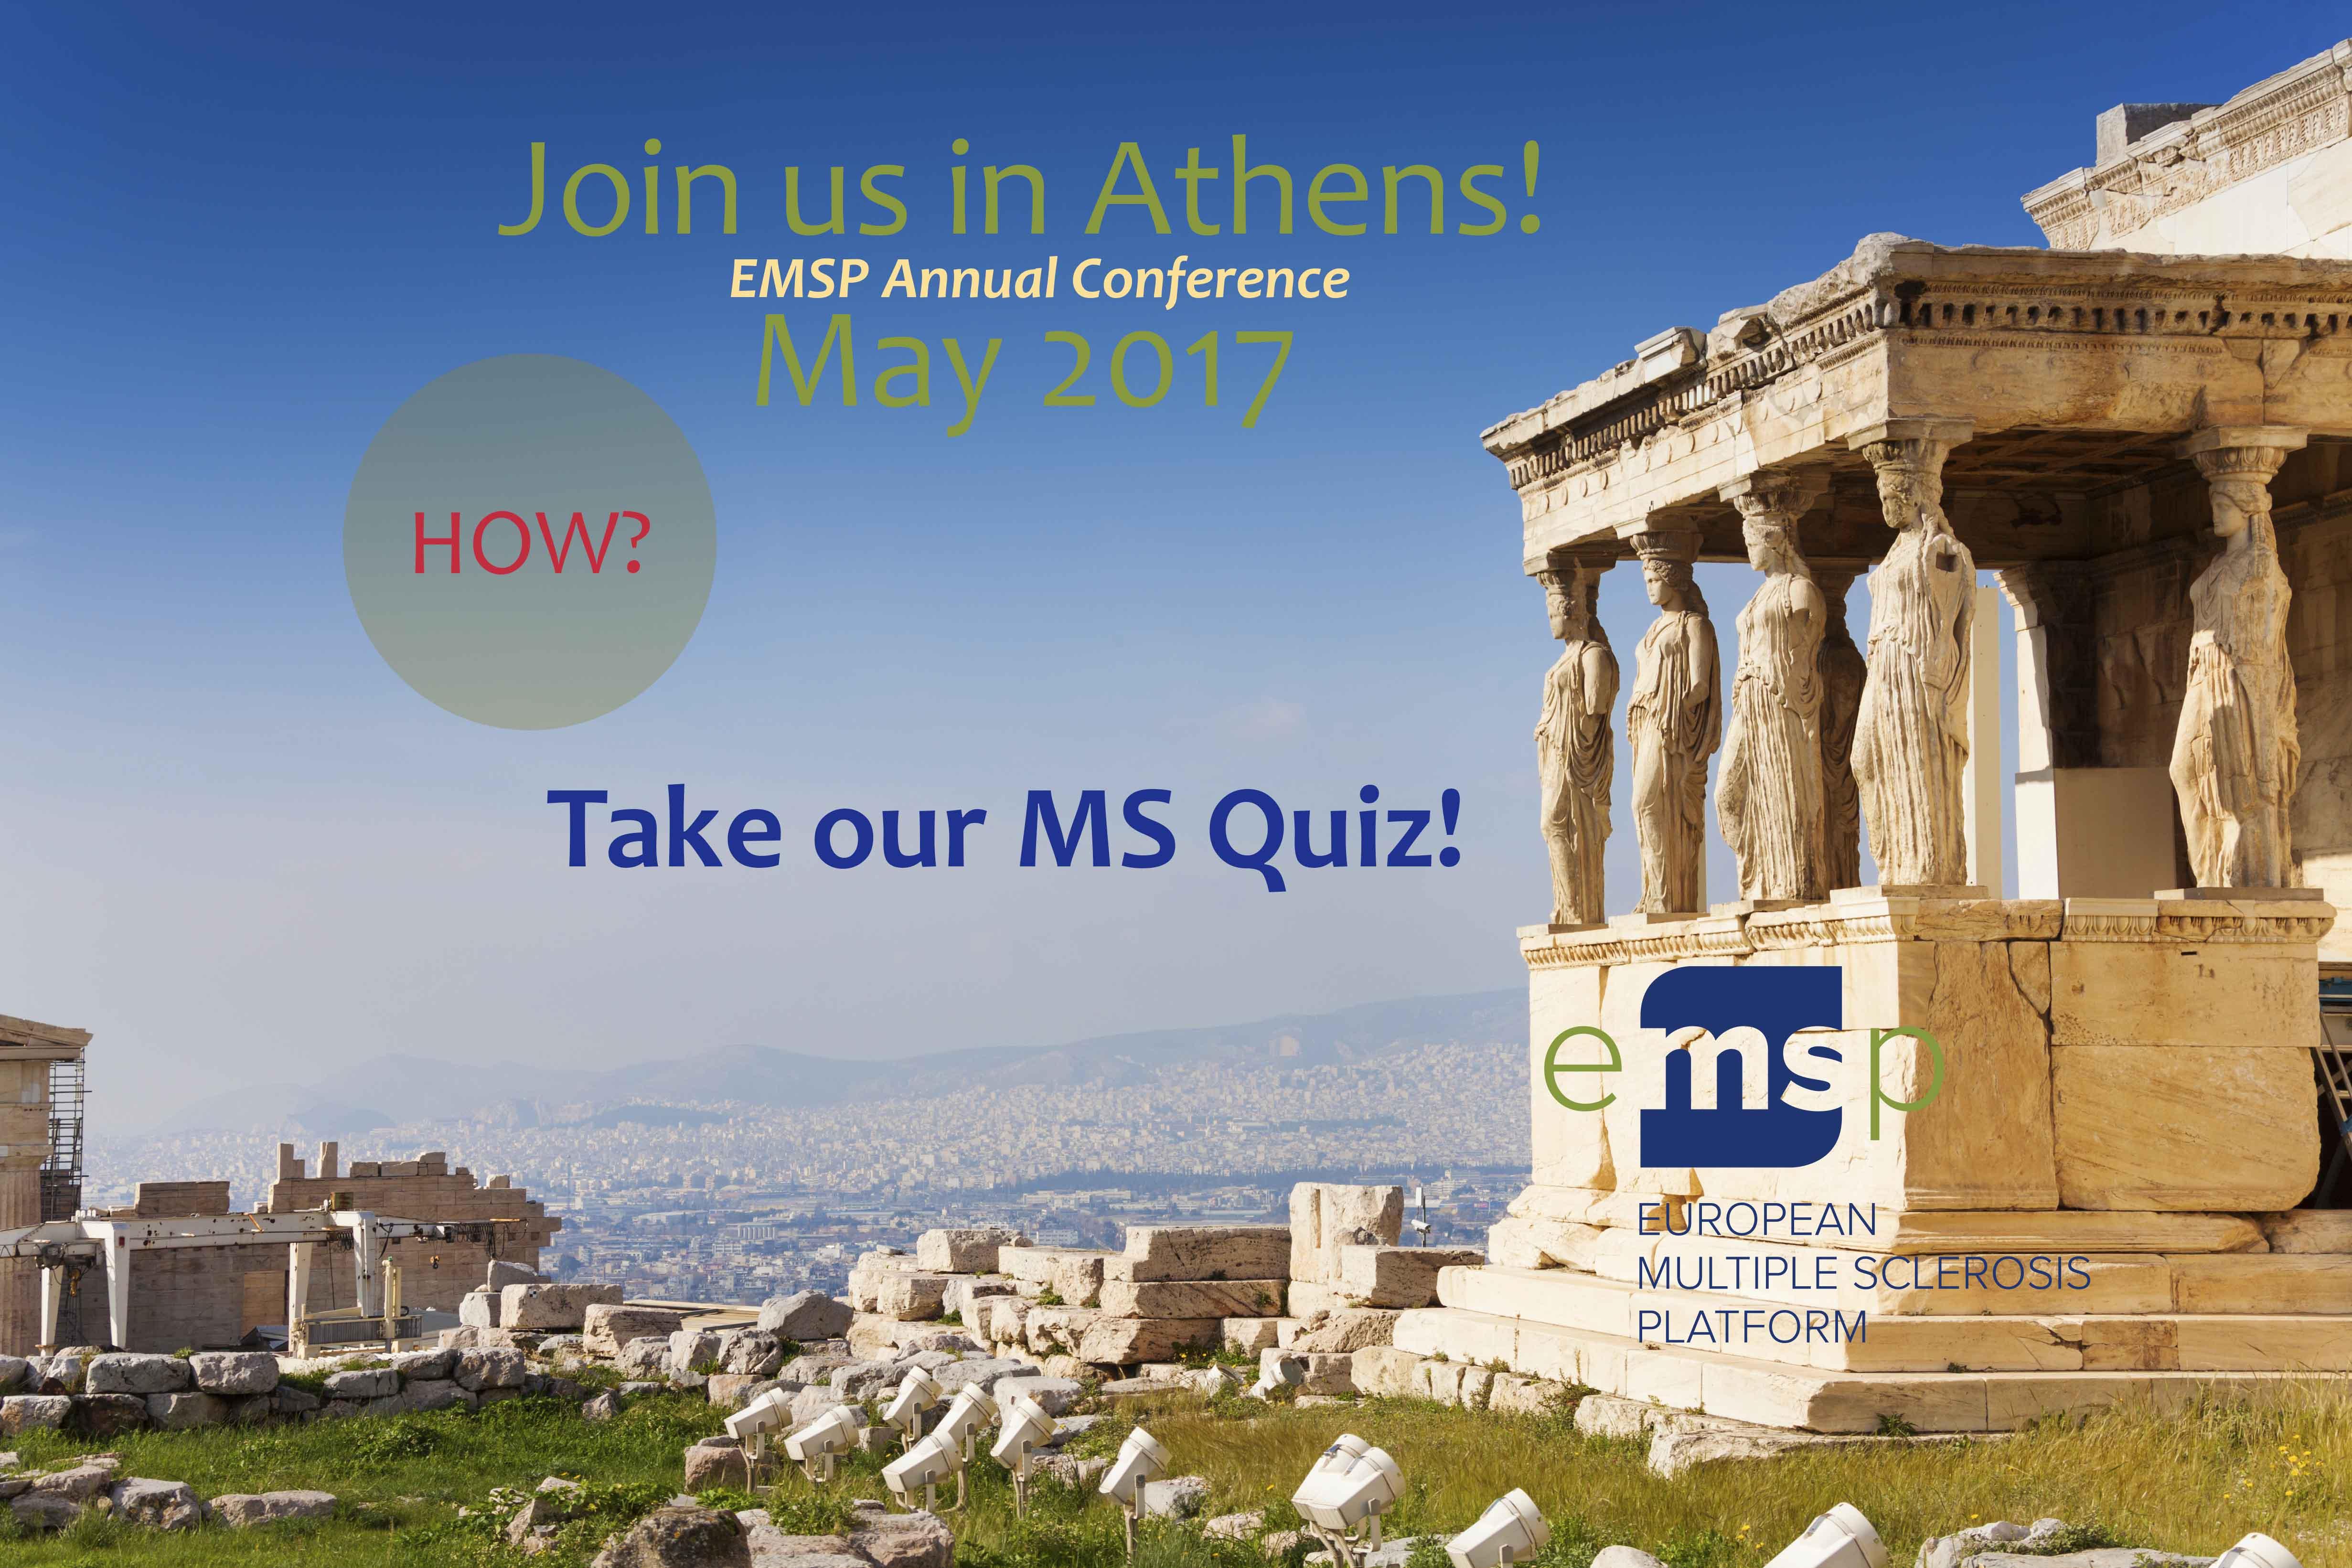 EMSP at ECTRIMS 2016: Delivering for MS communities